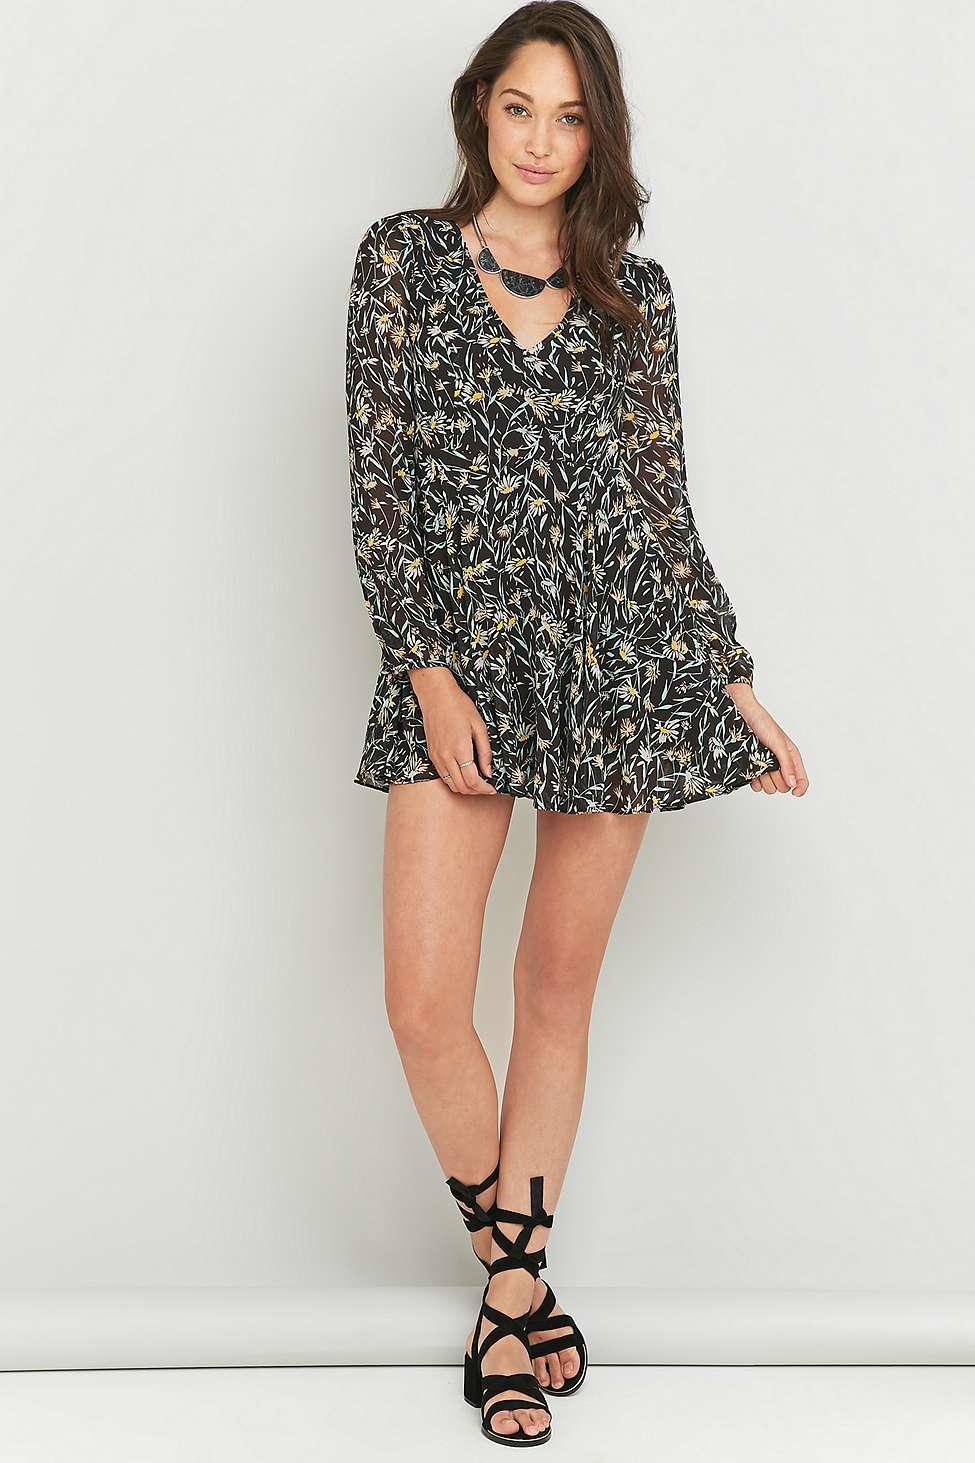 0174607555e1 ... where can i buy kimchi blue poppy grey floral dress in gray lyst 32fb7  f847f